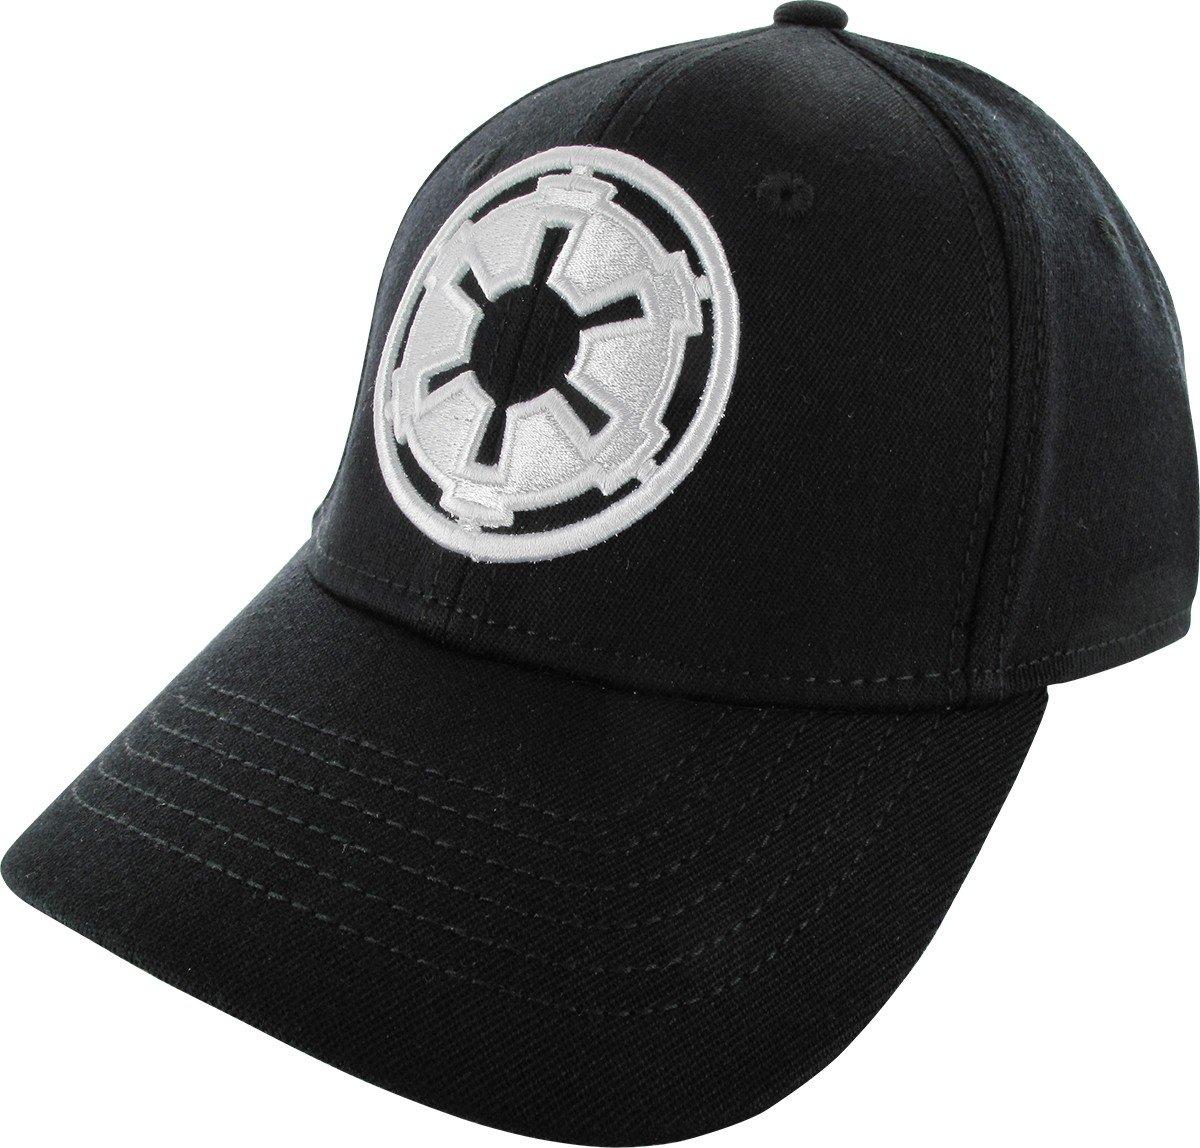 Star Wars VII The Force Awakens Galactic Empire Flex Baseball Cap